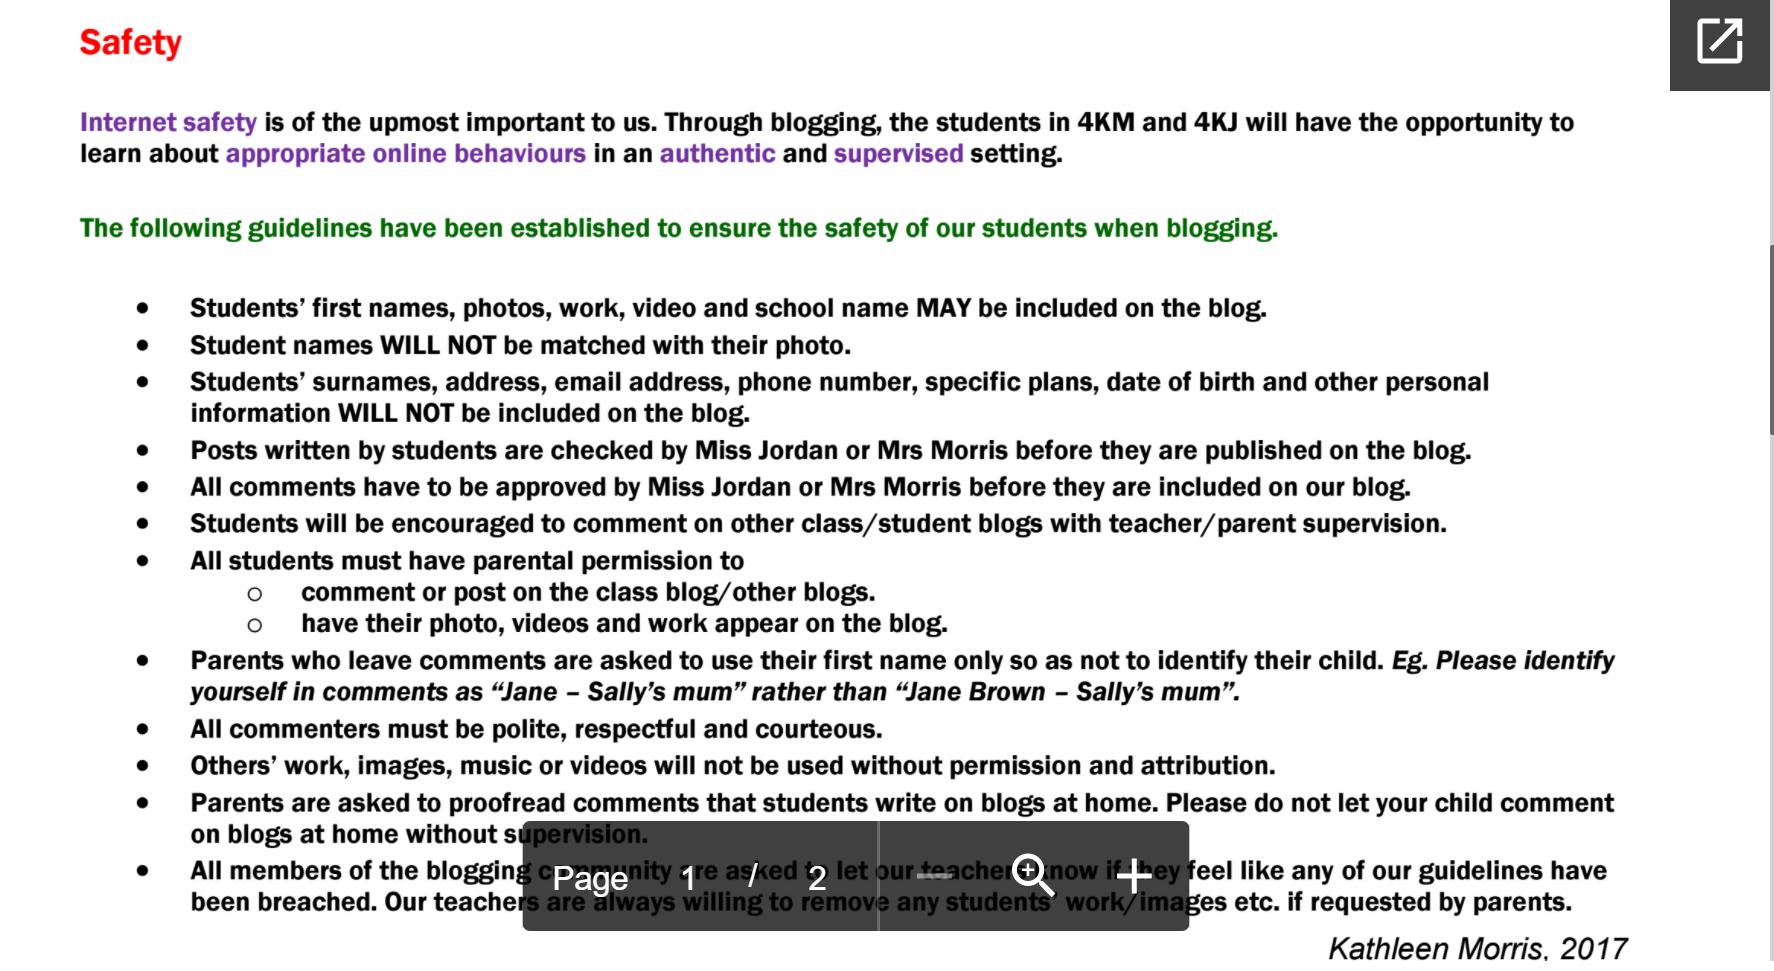 files/images/blog_permission.PNG